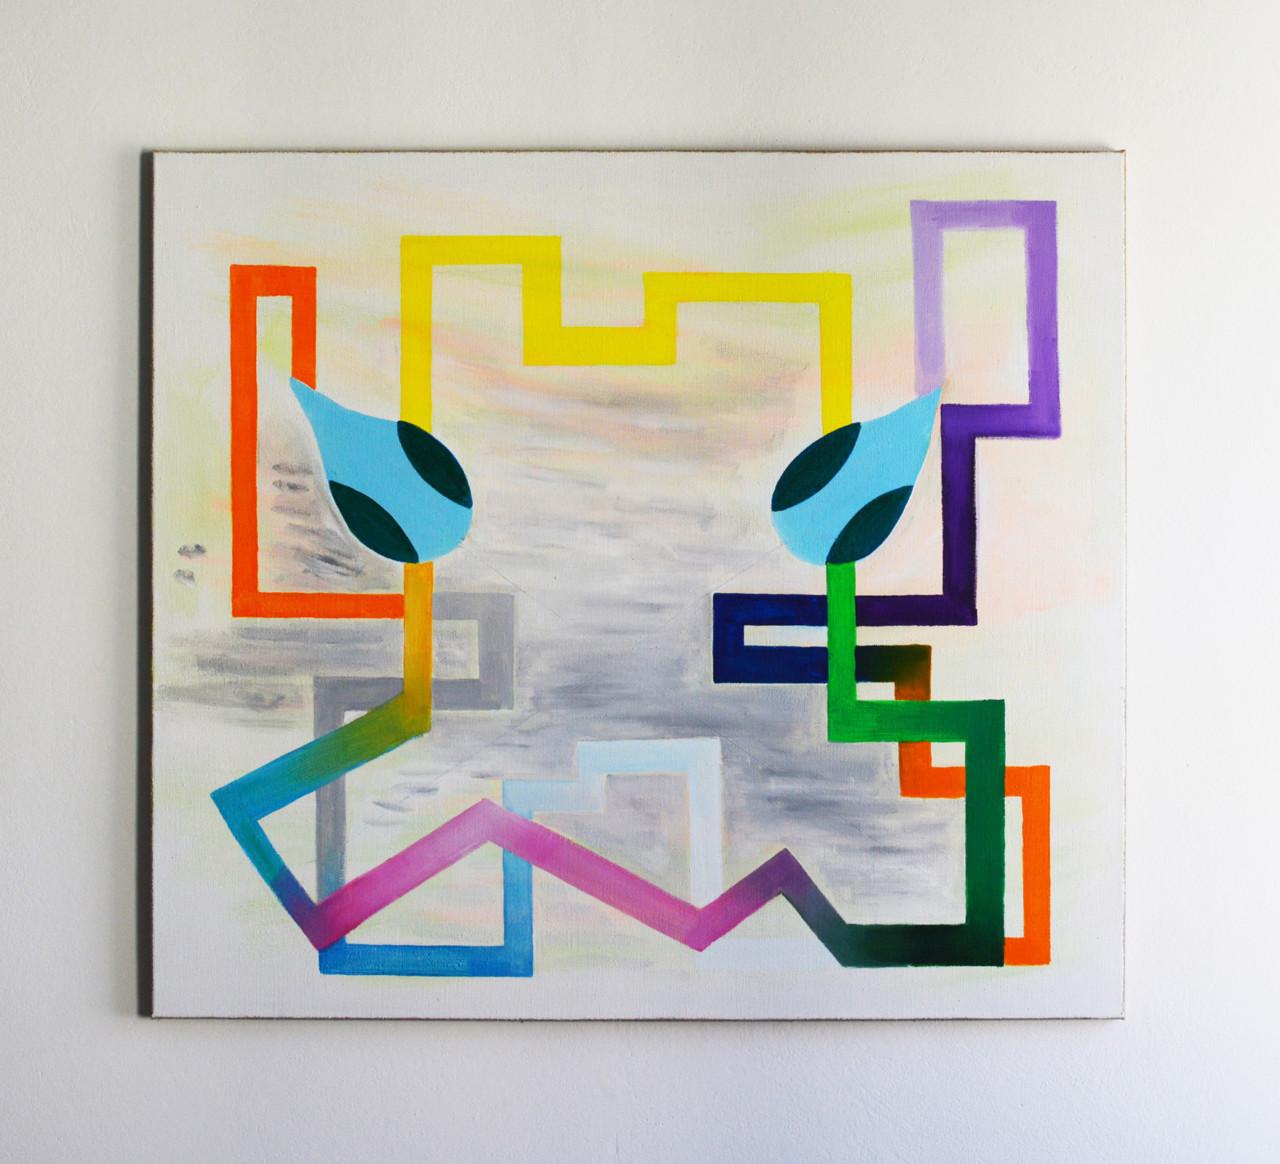 Ulrich Hakel BKTcolori